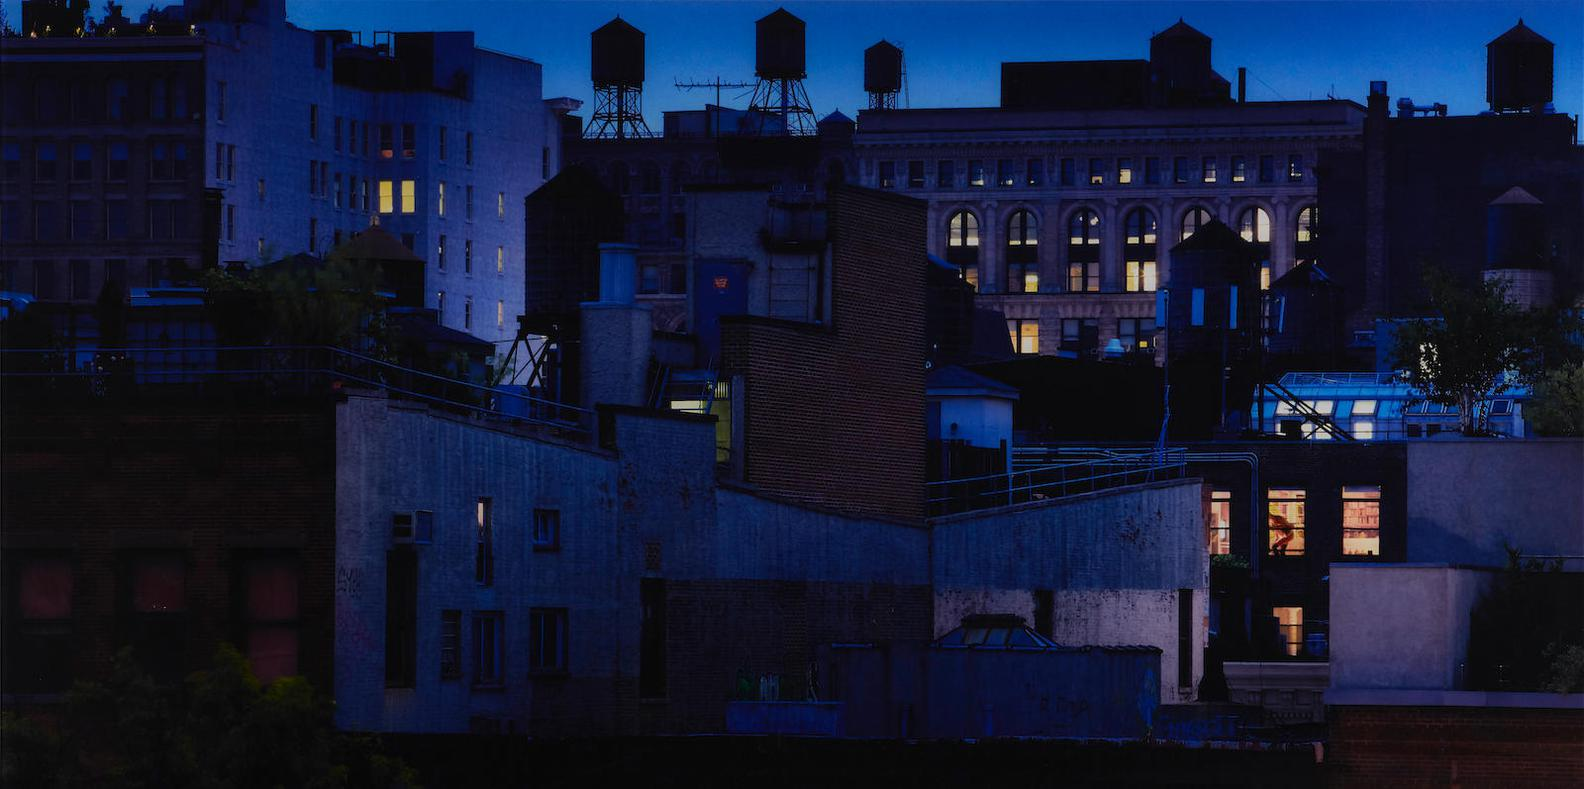 David Drebin-Gotham City-2010